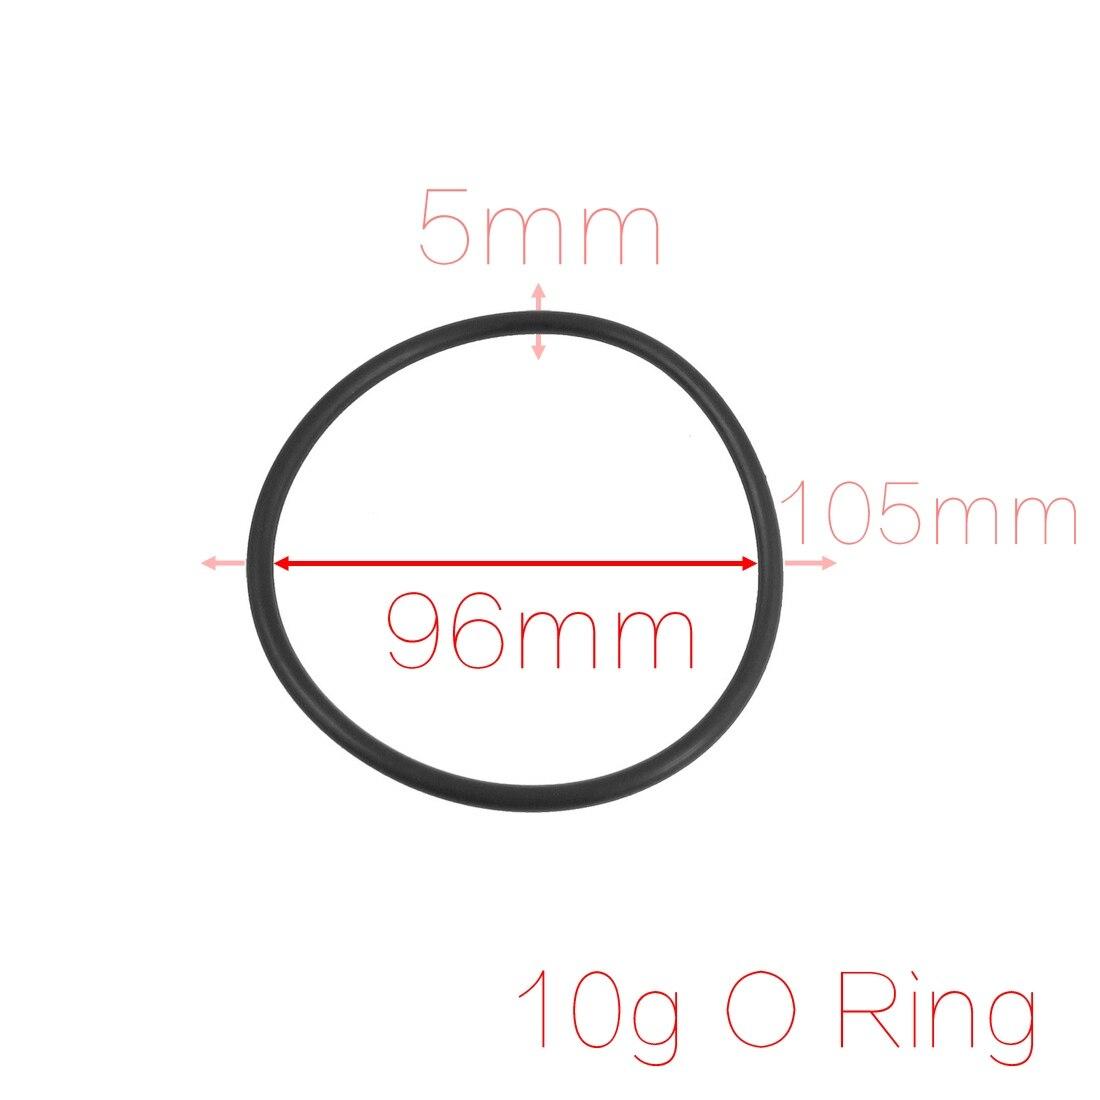 Prohex 7 Mm X 4 15 Karet O Ring Oil Seal Mesin Cuci Kaos Kaki Jempol Motif Henna Cr 006 Aeproductgetsubject